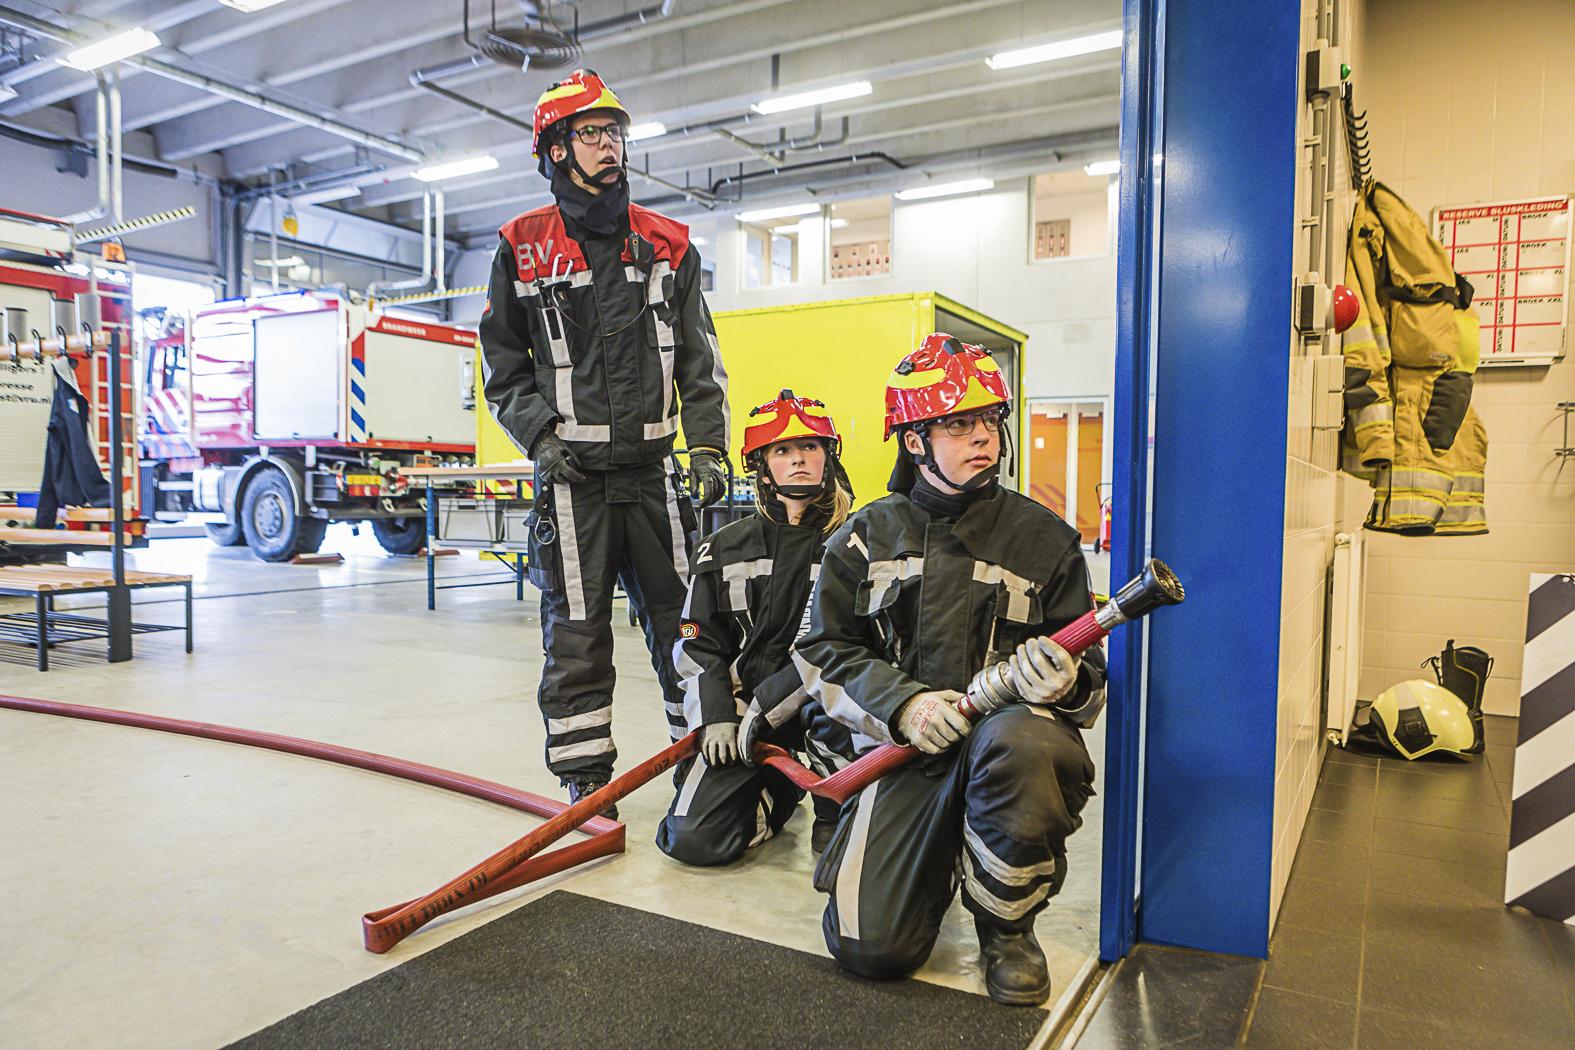 20190522-20190522-Jeugdbrandweer-kweekvijver-voor-brandweer-3